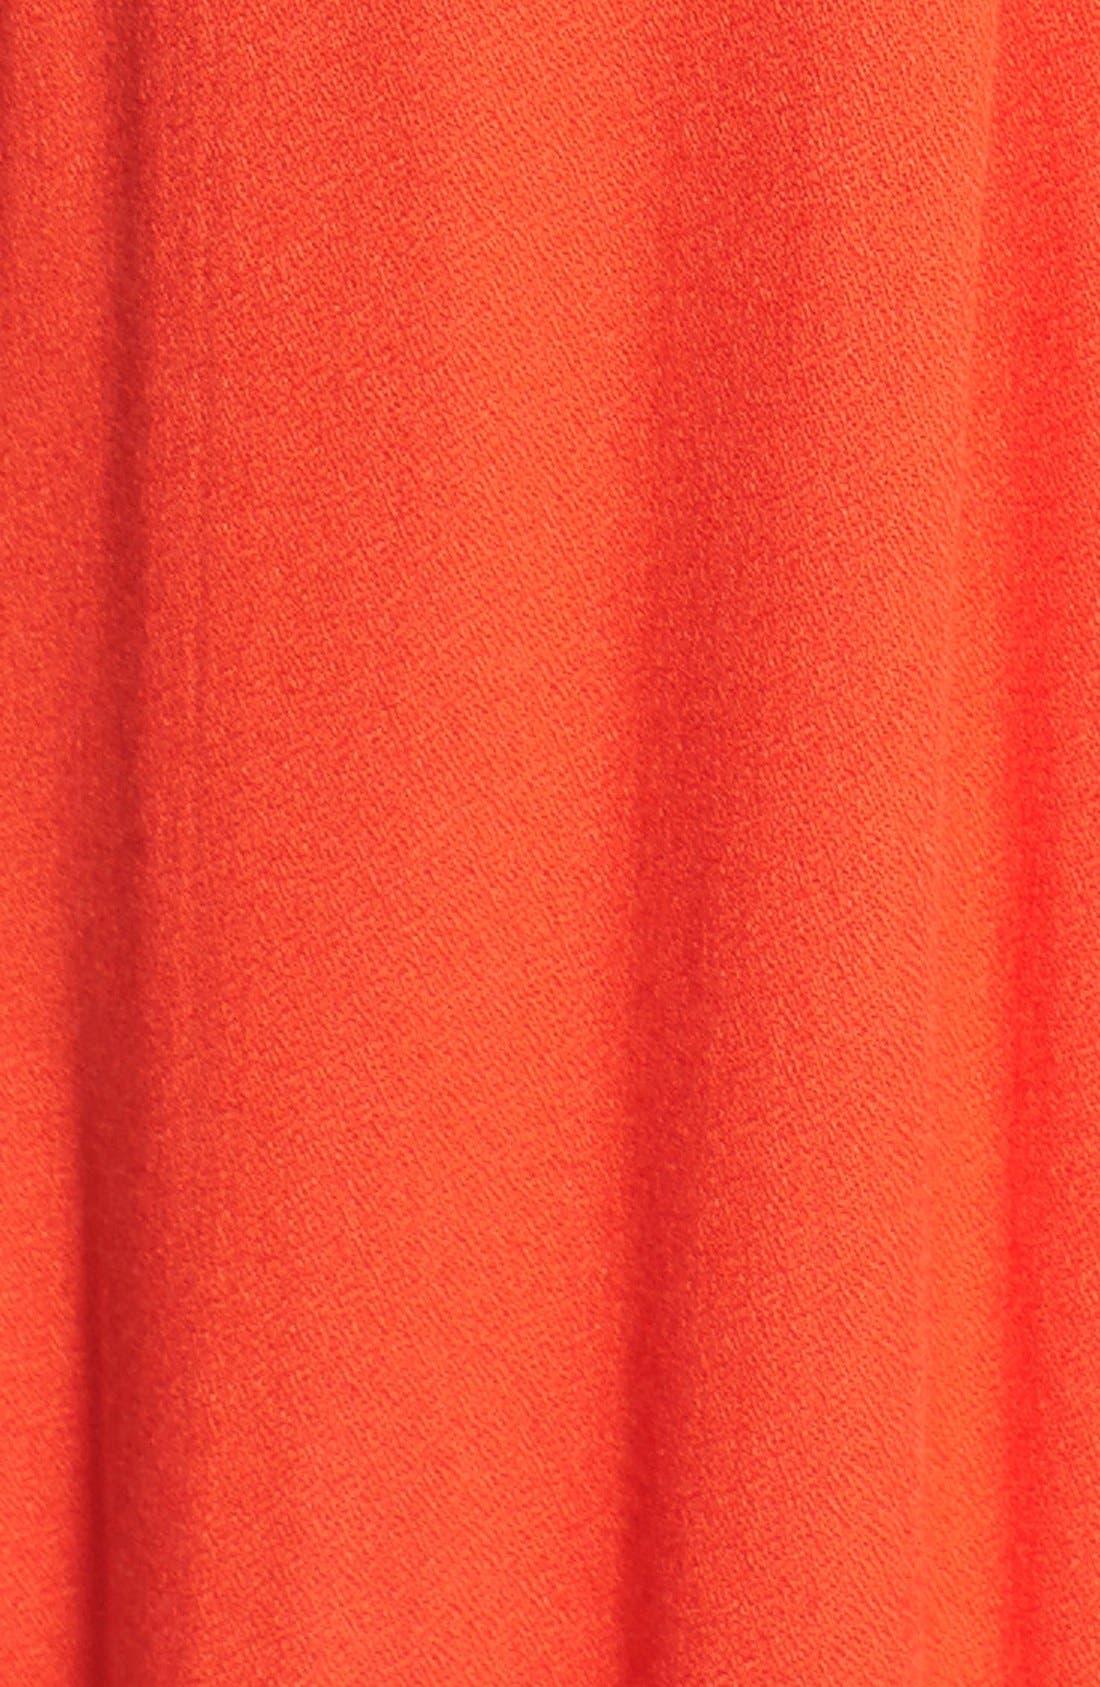 'Stella' Colorblock Maxi Dress,                             Alternate thumbnail 3, color,                             Persimmon